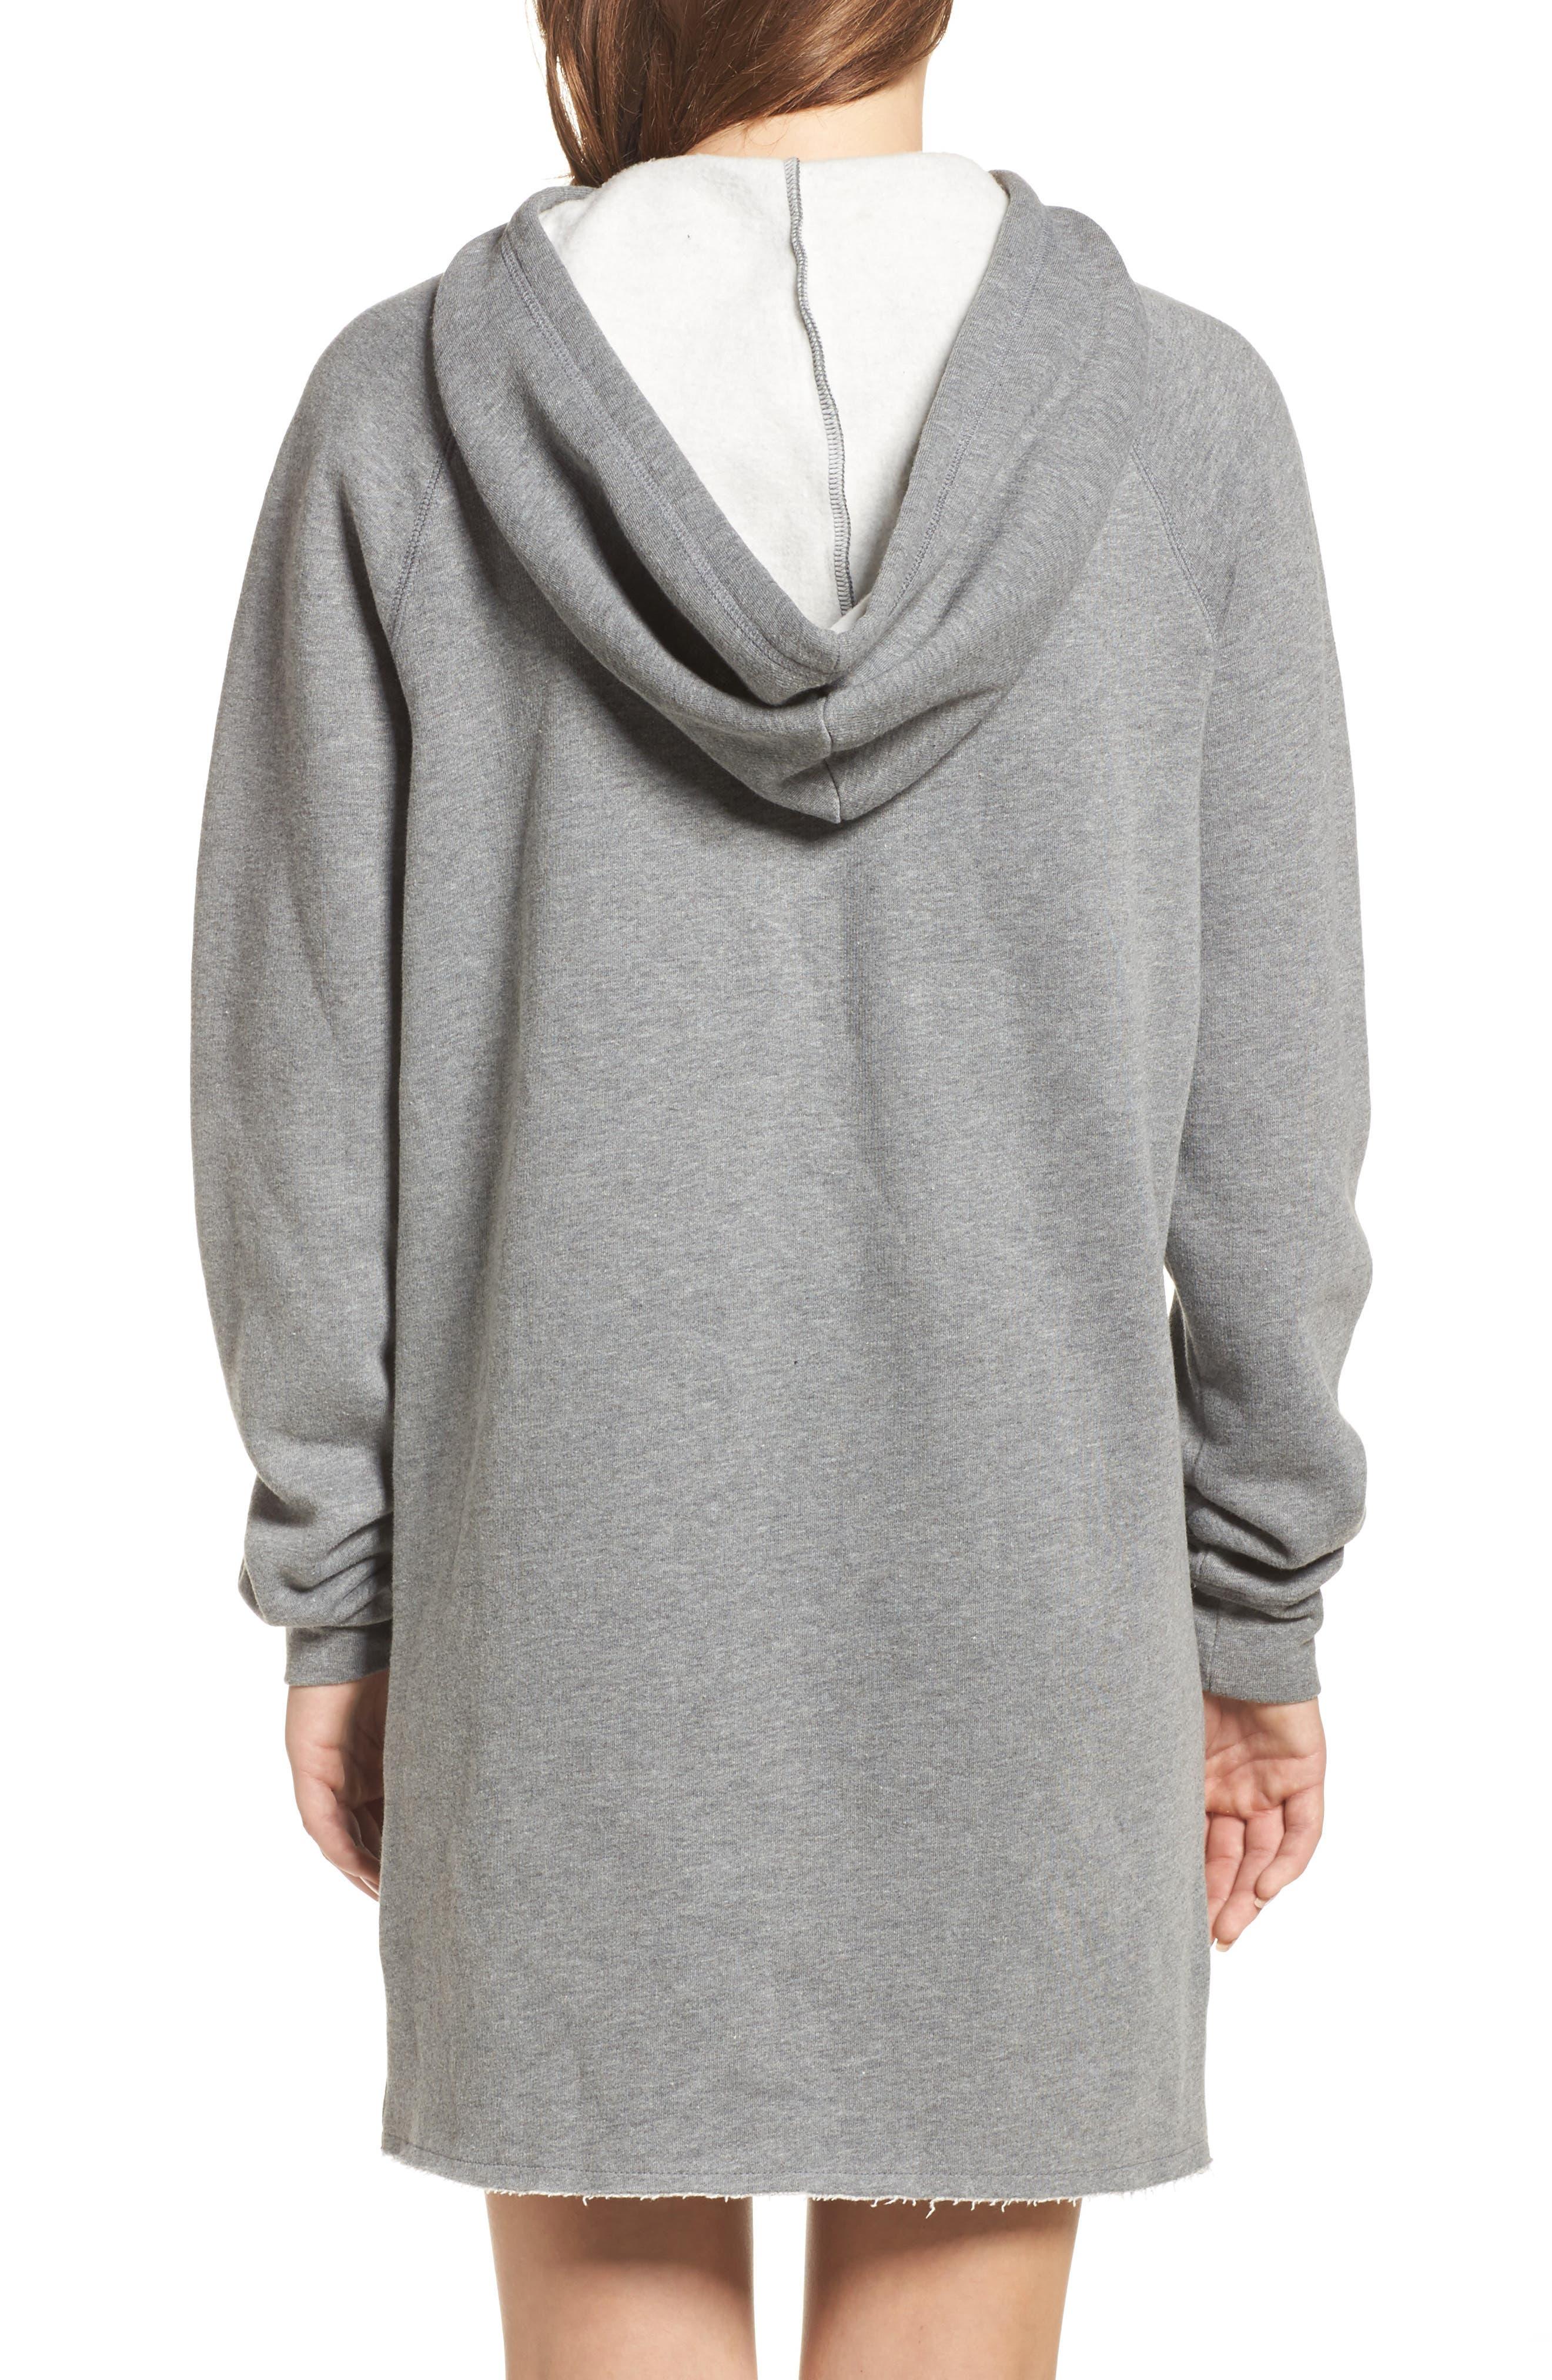 Brunette Sweatshirt Dress,                             Alternate thumbnail 2, color,                             020